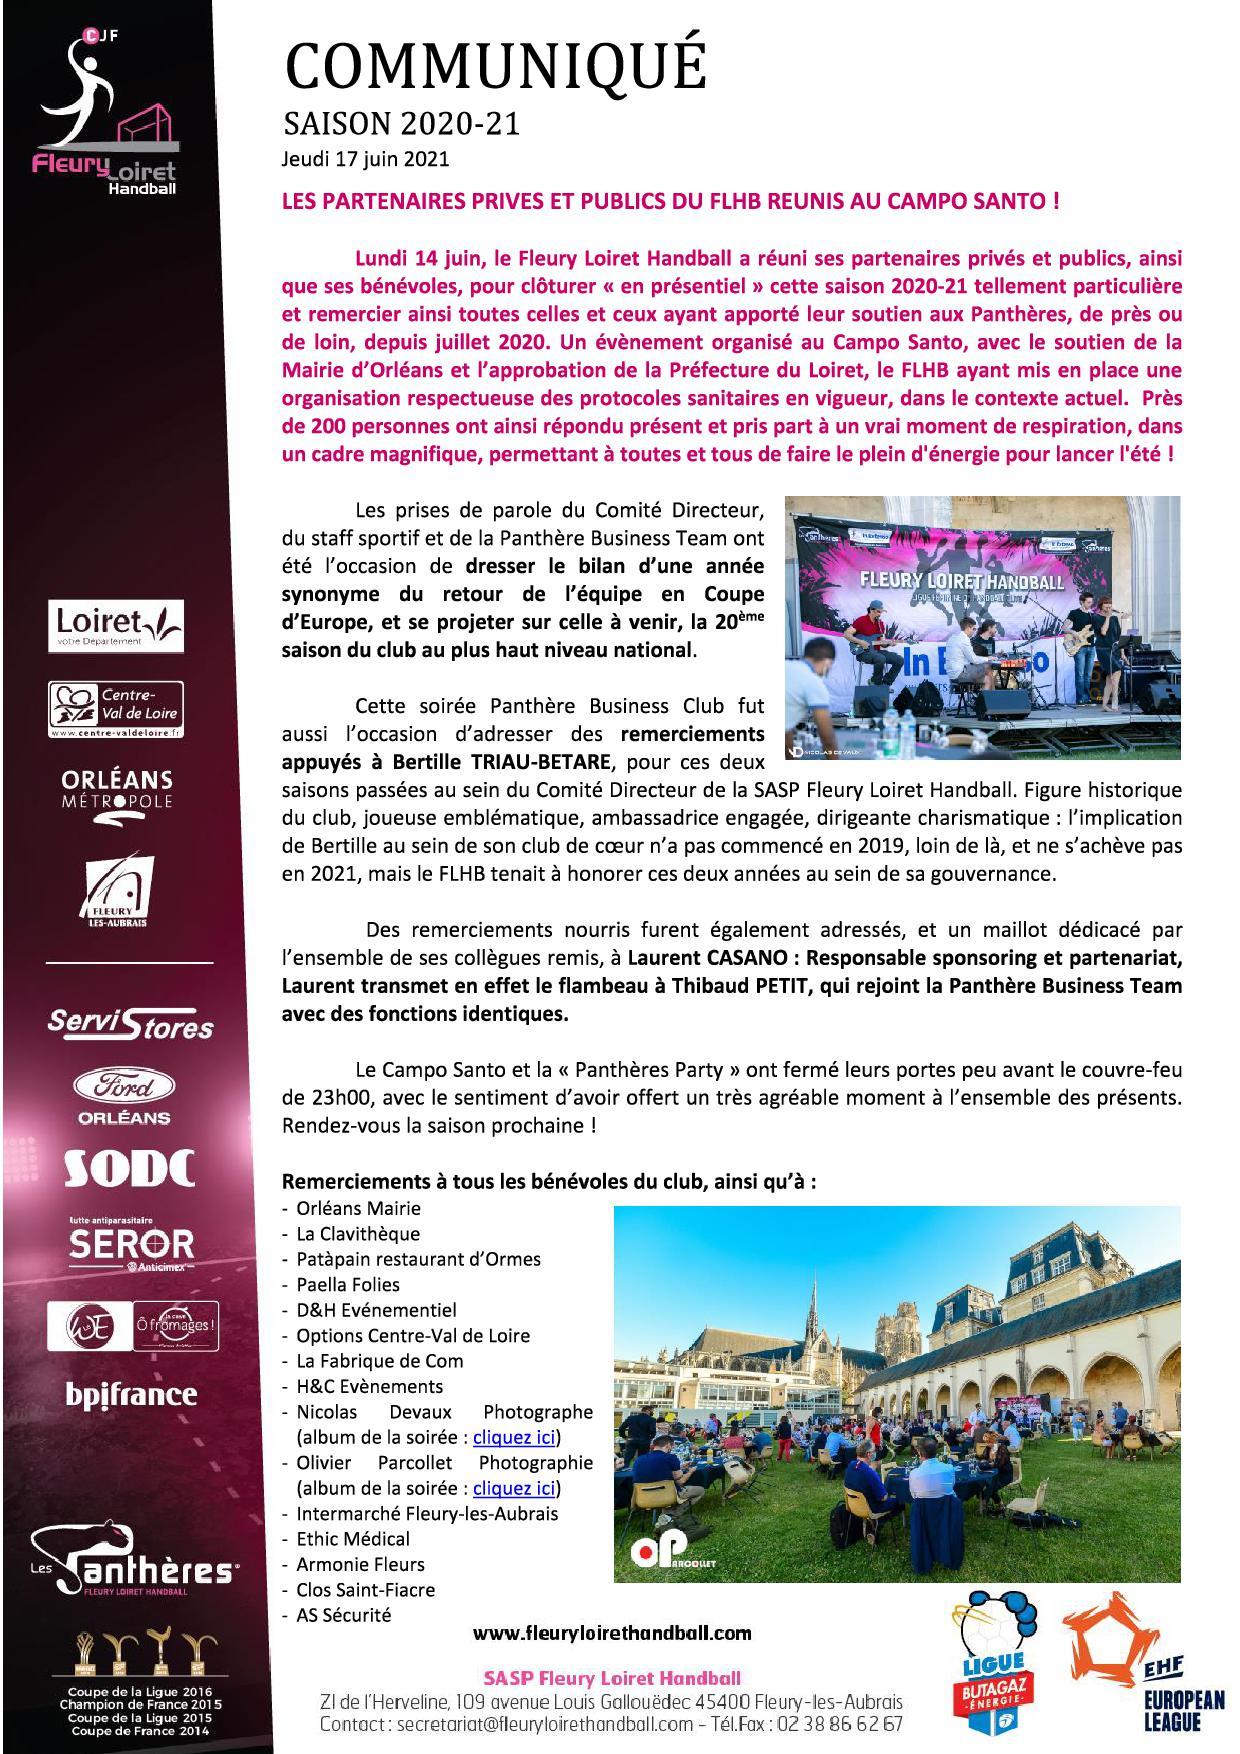 Communiqué Fleury Loiret Handball - Jeudi 17 juin 2021.jpg